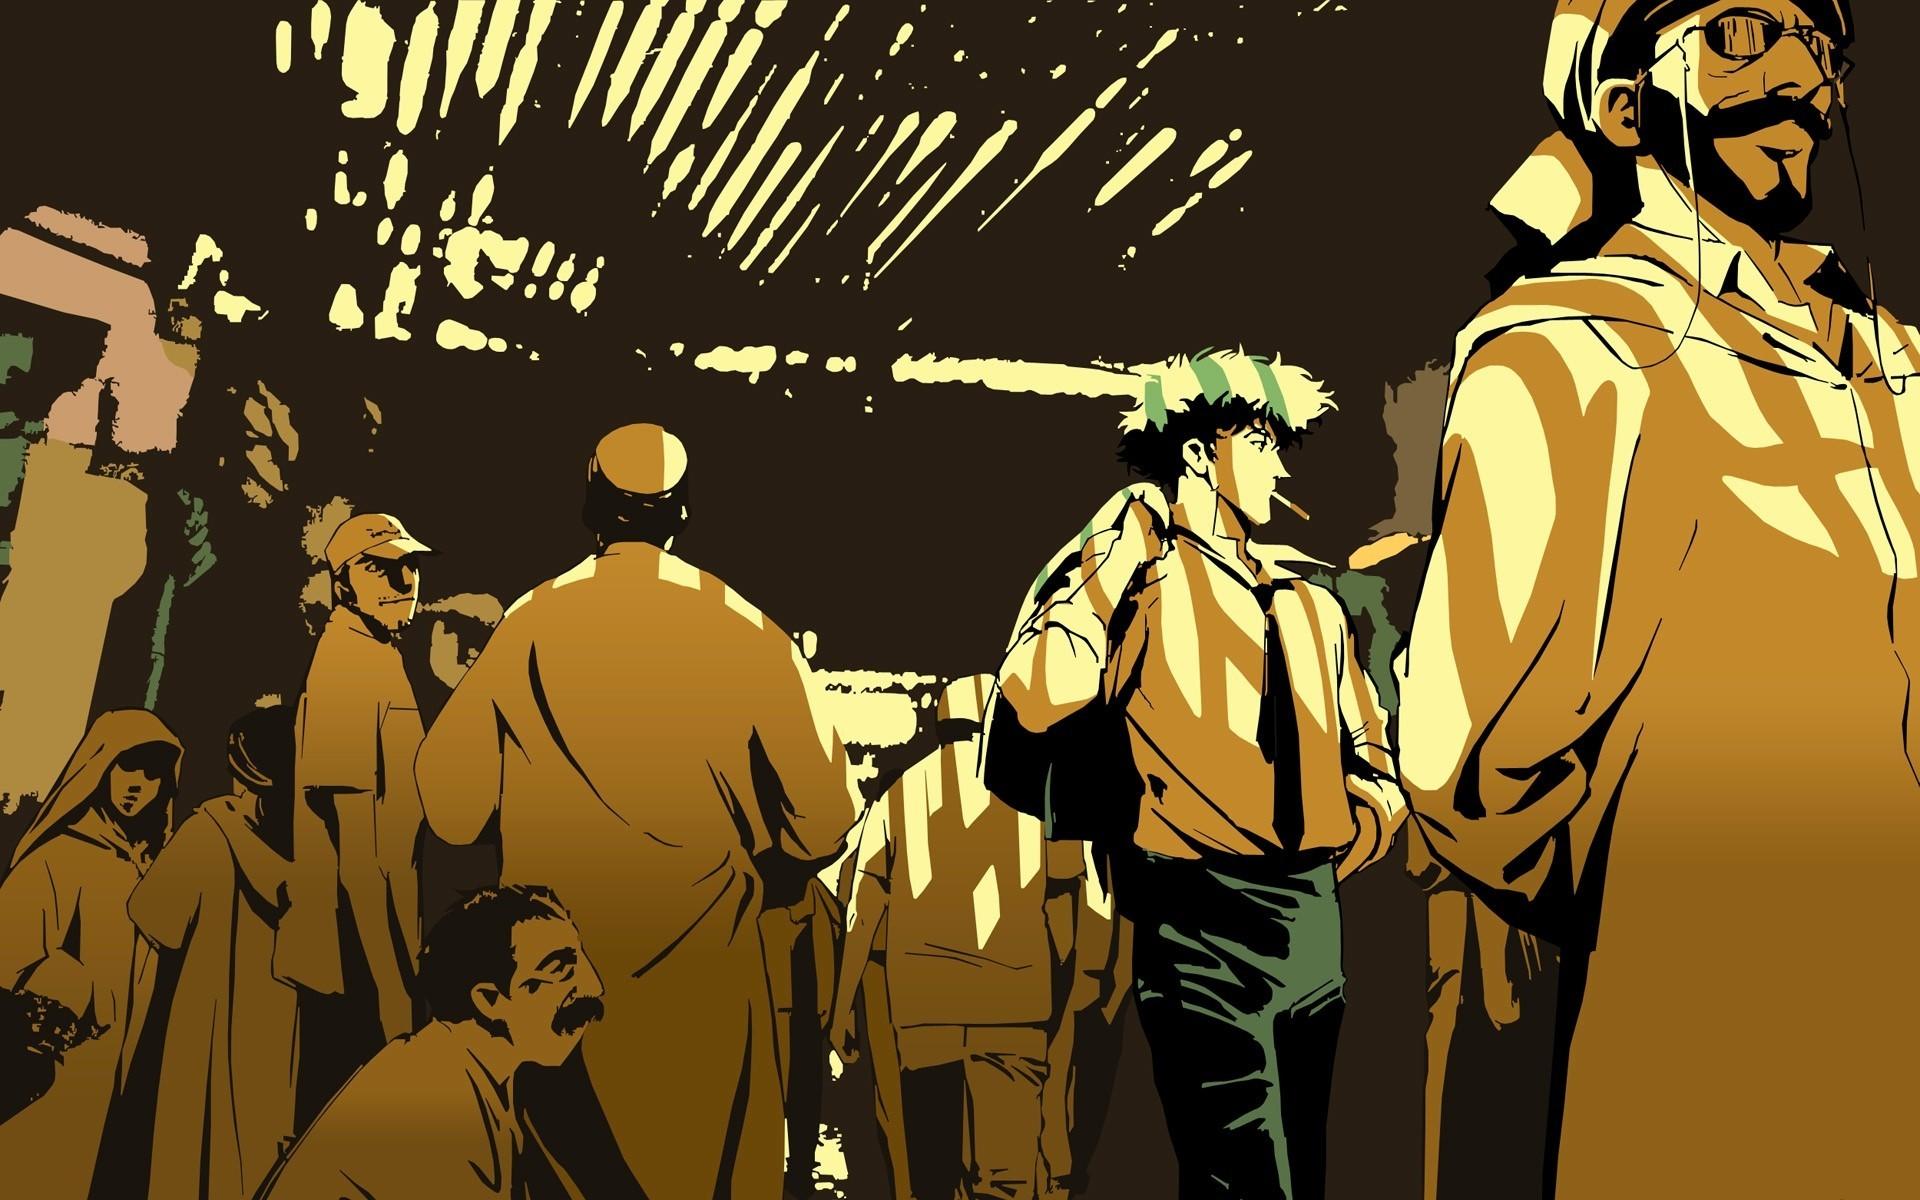 Cowboy Bebop Wallpaper Cowboy, Bebop, People, Crowd, Travel .